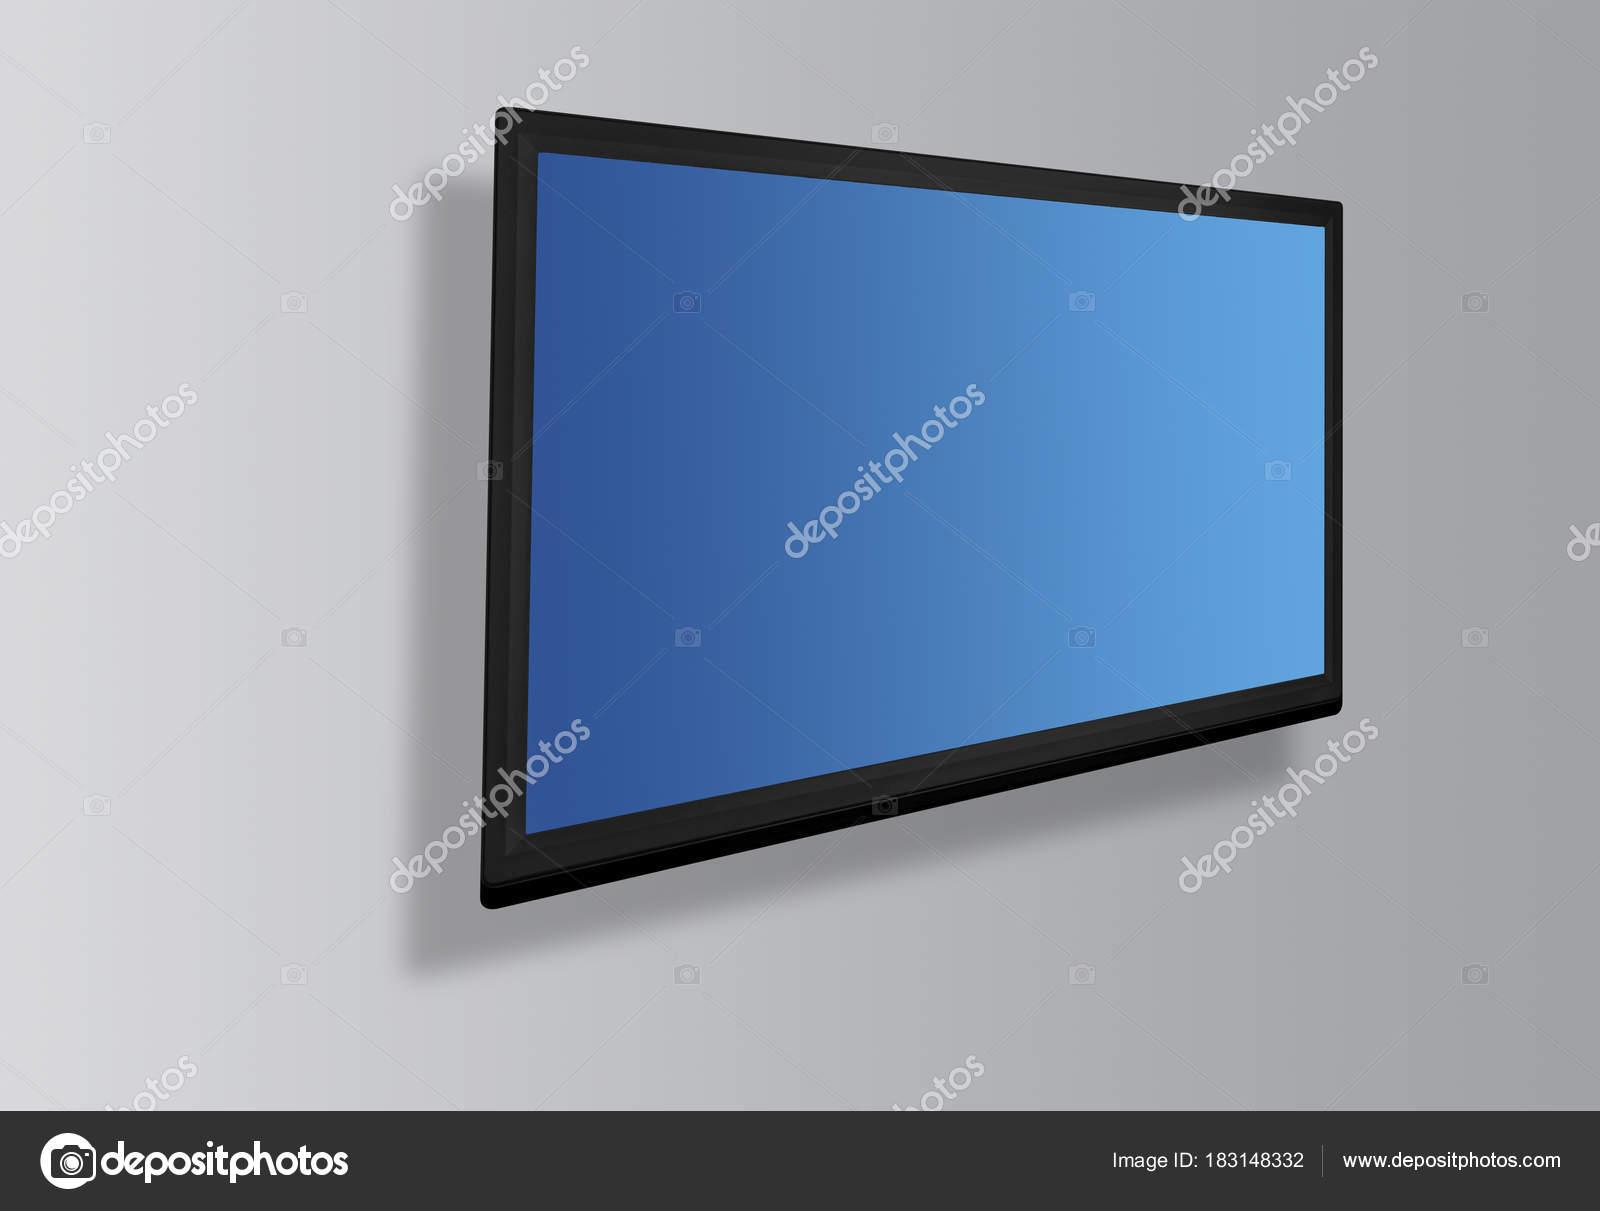 led oder lcd tv bildschirm h ngt an der wand hintergrund stockfoto smuki 183148332. Black Bedroom Furniture Sets. Home Design Ideas